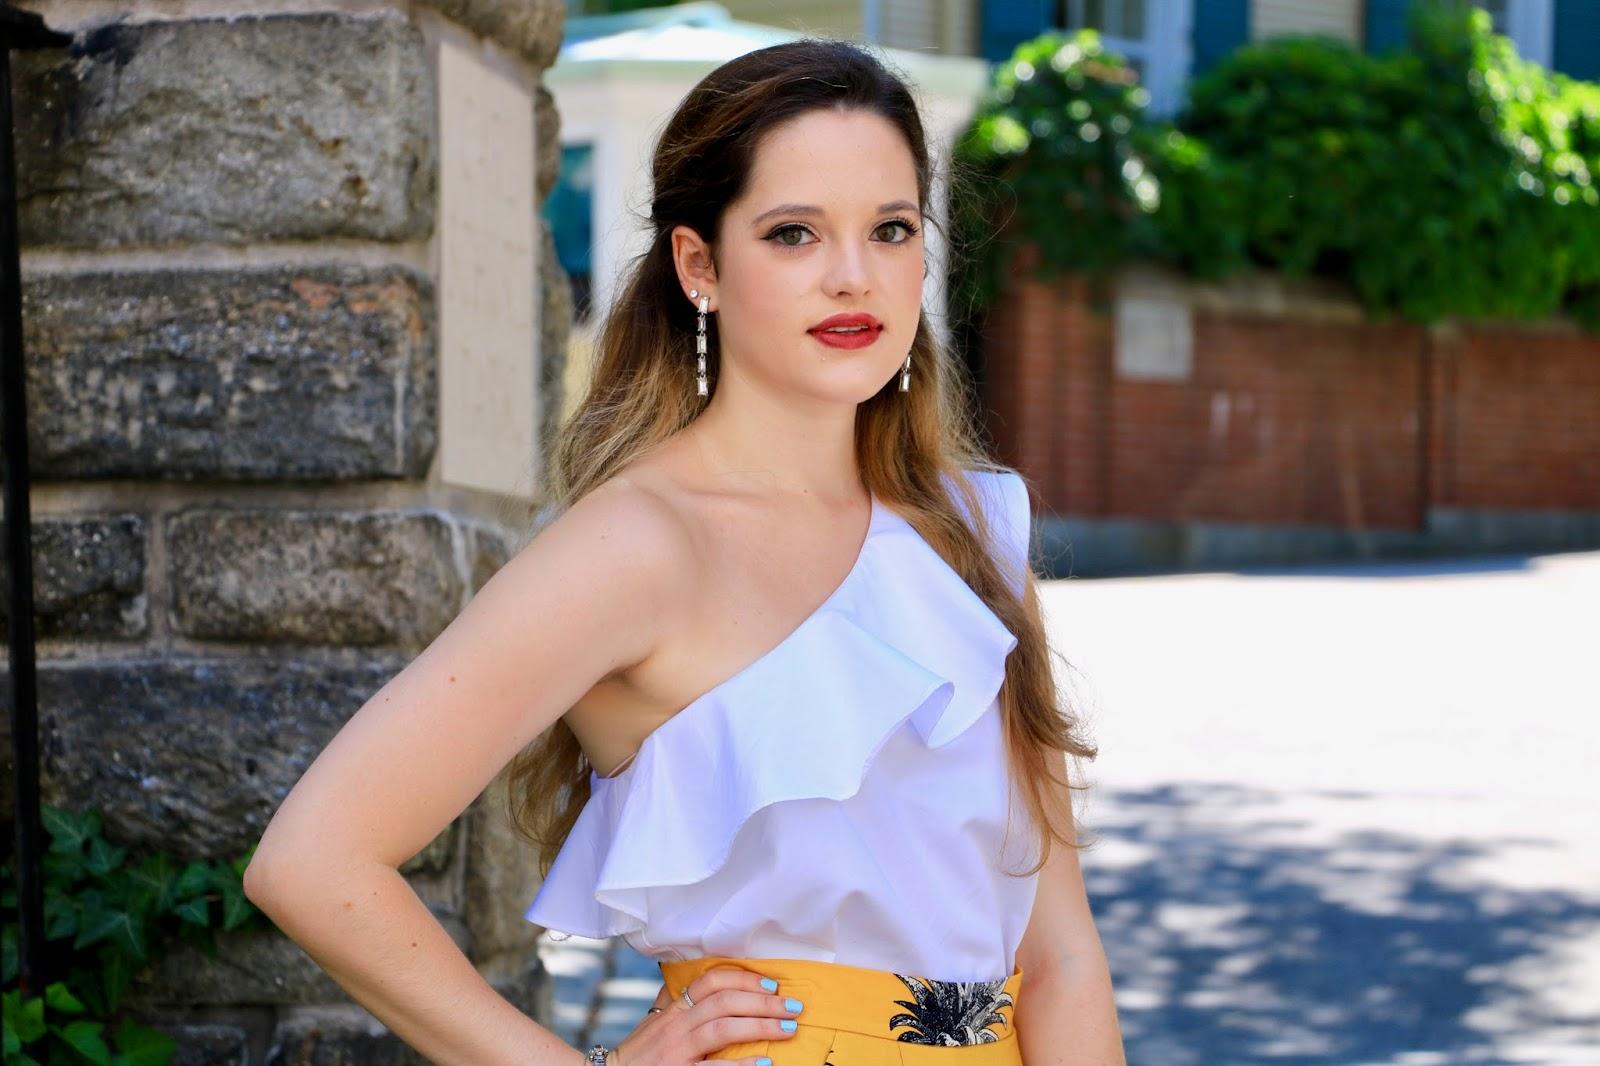 nyc fashion blogger kathleen harper wearing a one-shoulder ruffle blouse